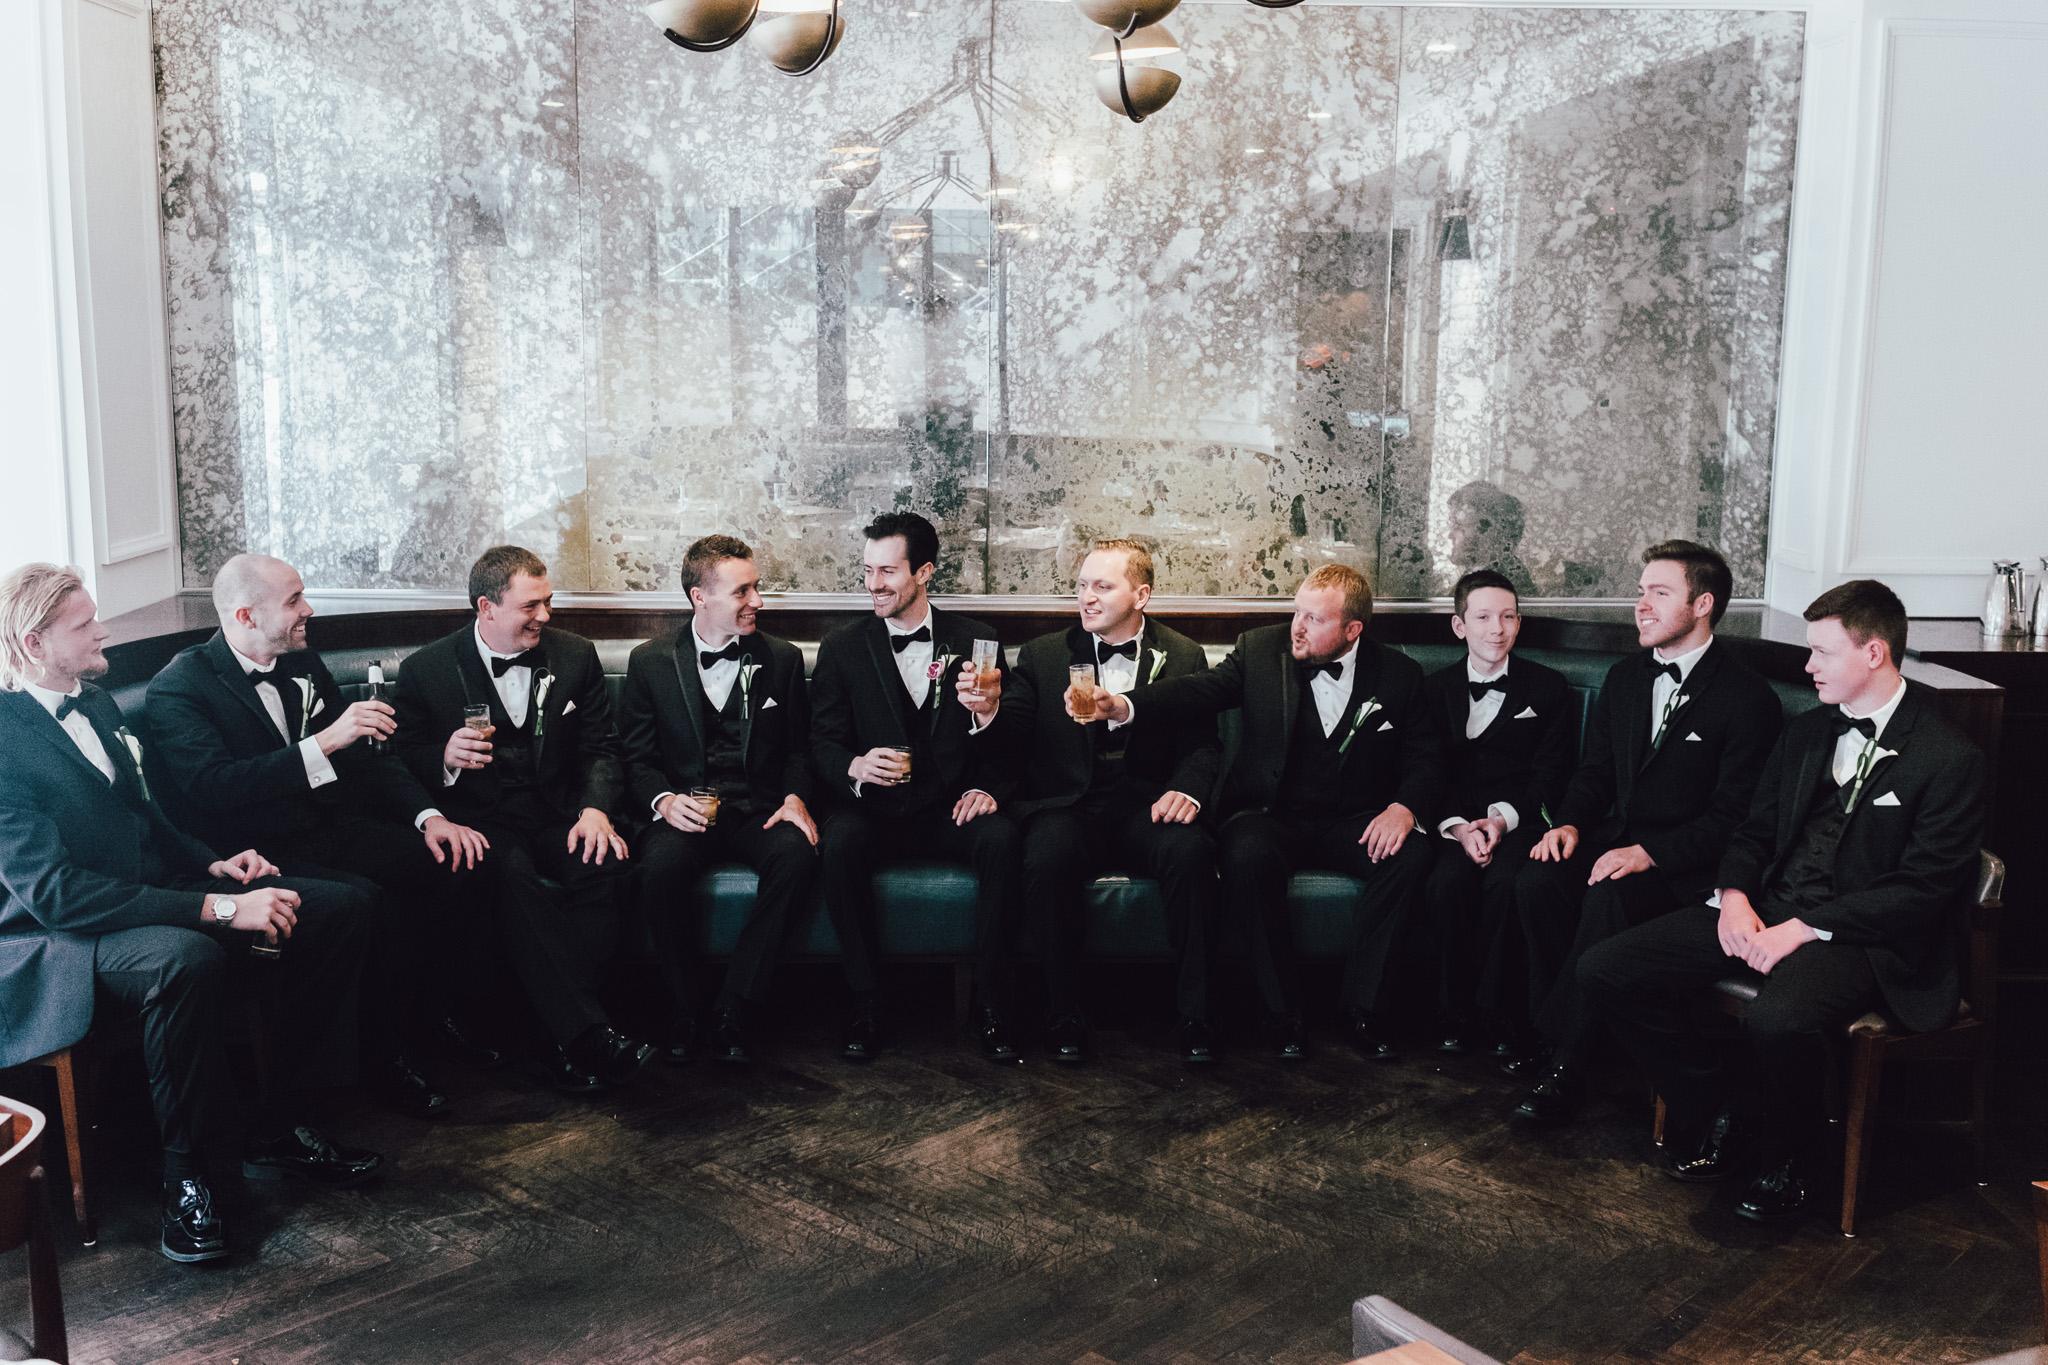 Brooke-Kyle-Indianapolis-Wedding-Blog-64.jpg